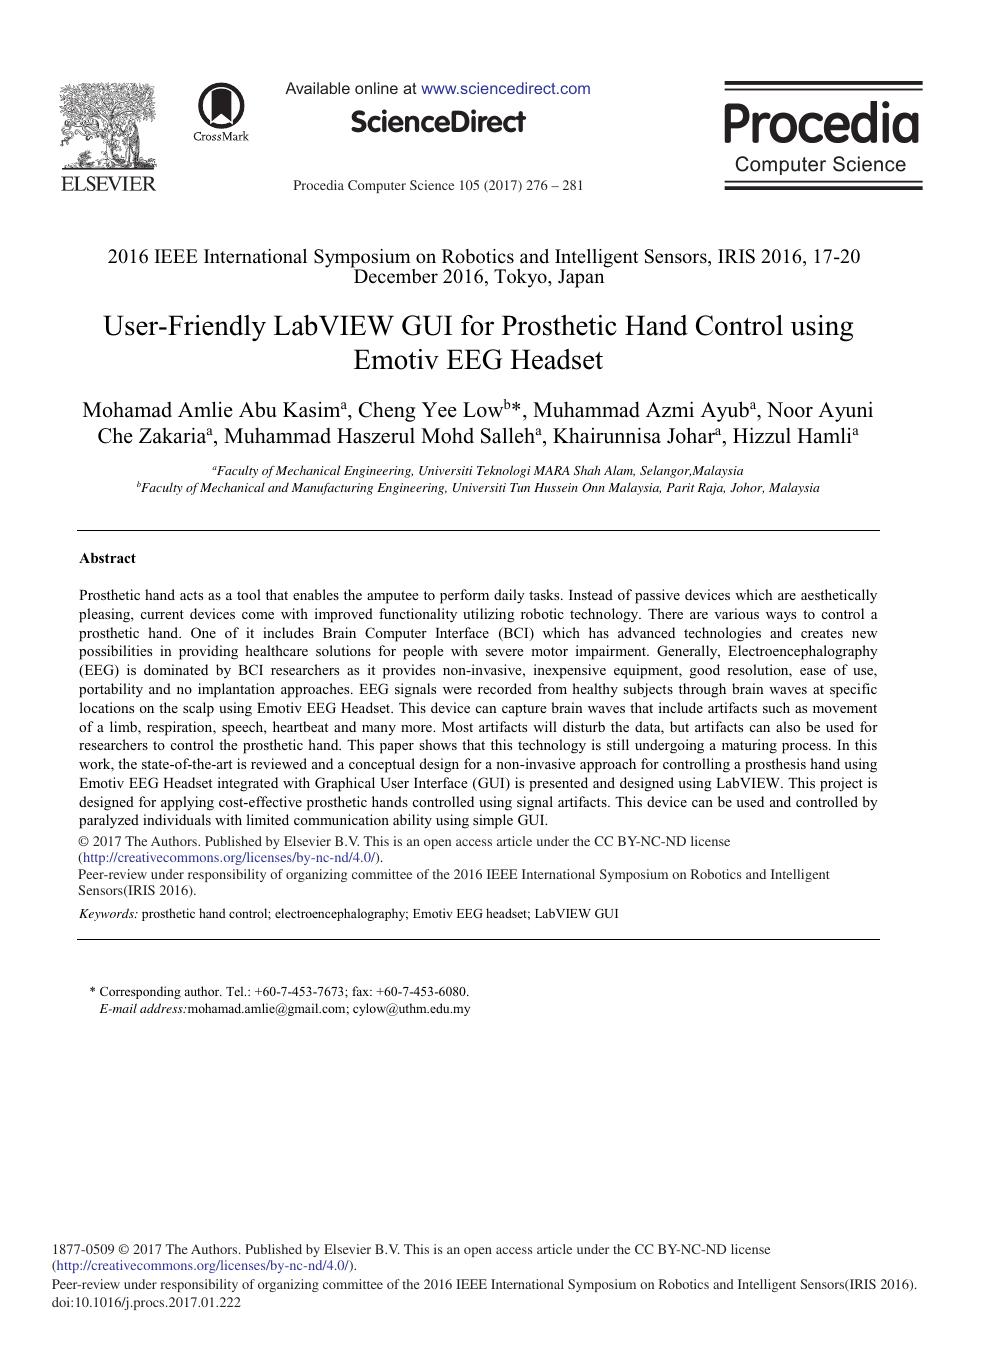 Eeg Industrial Process Control Functional Block Diagram